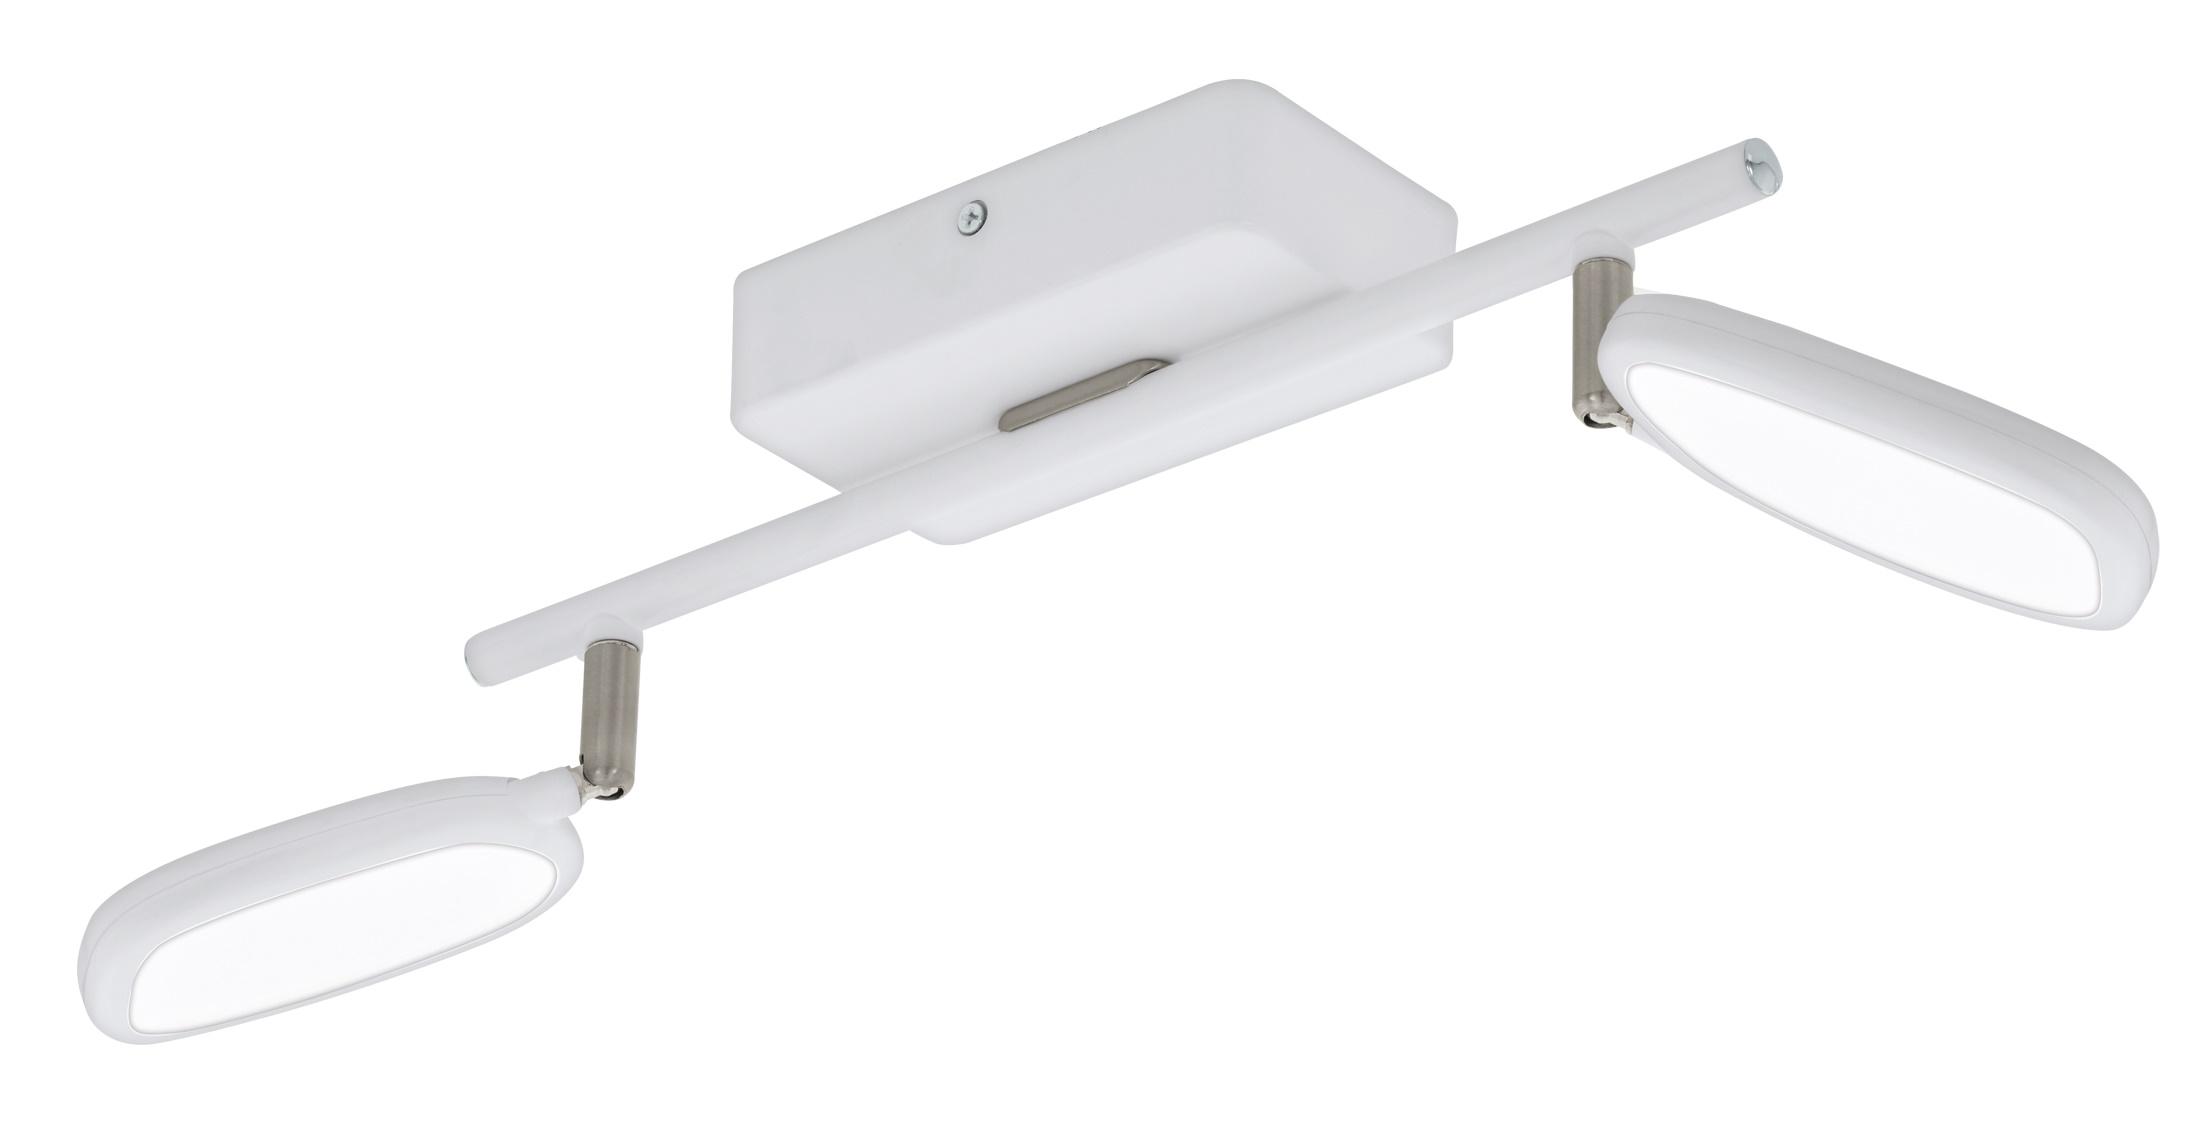 Aplica Eglo Connect Palombare-C 2x5W LED-RGB 1200lm Alb poza